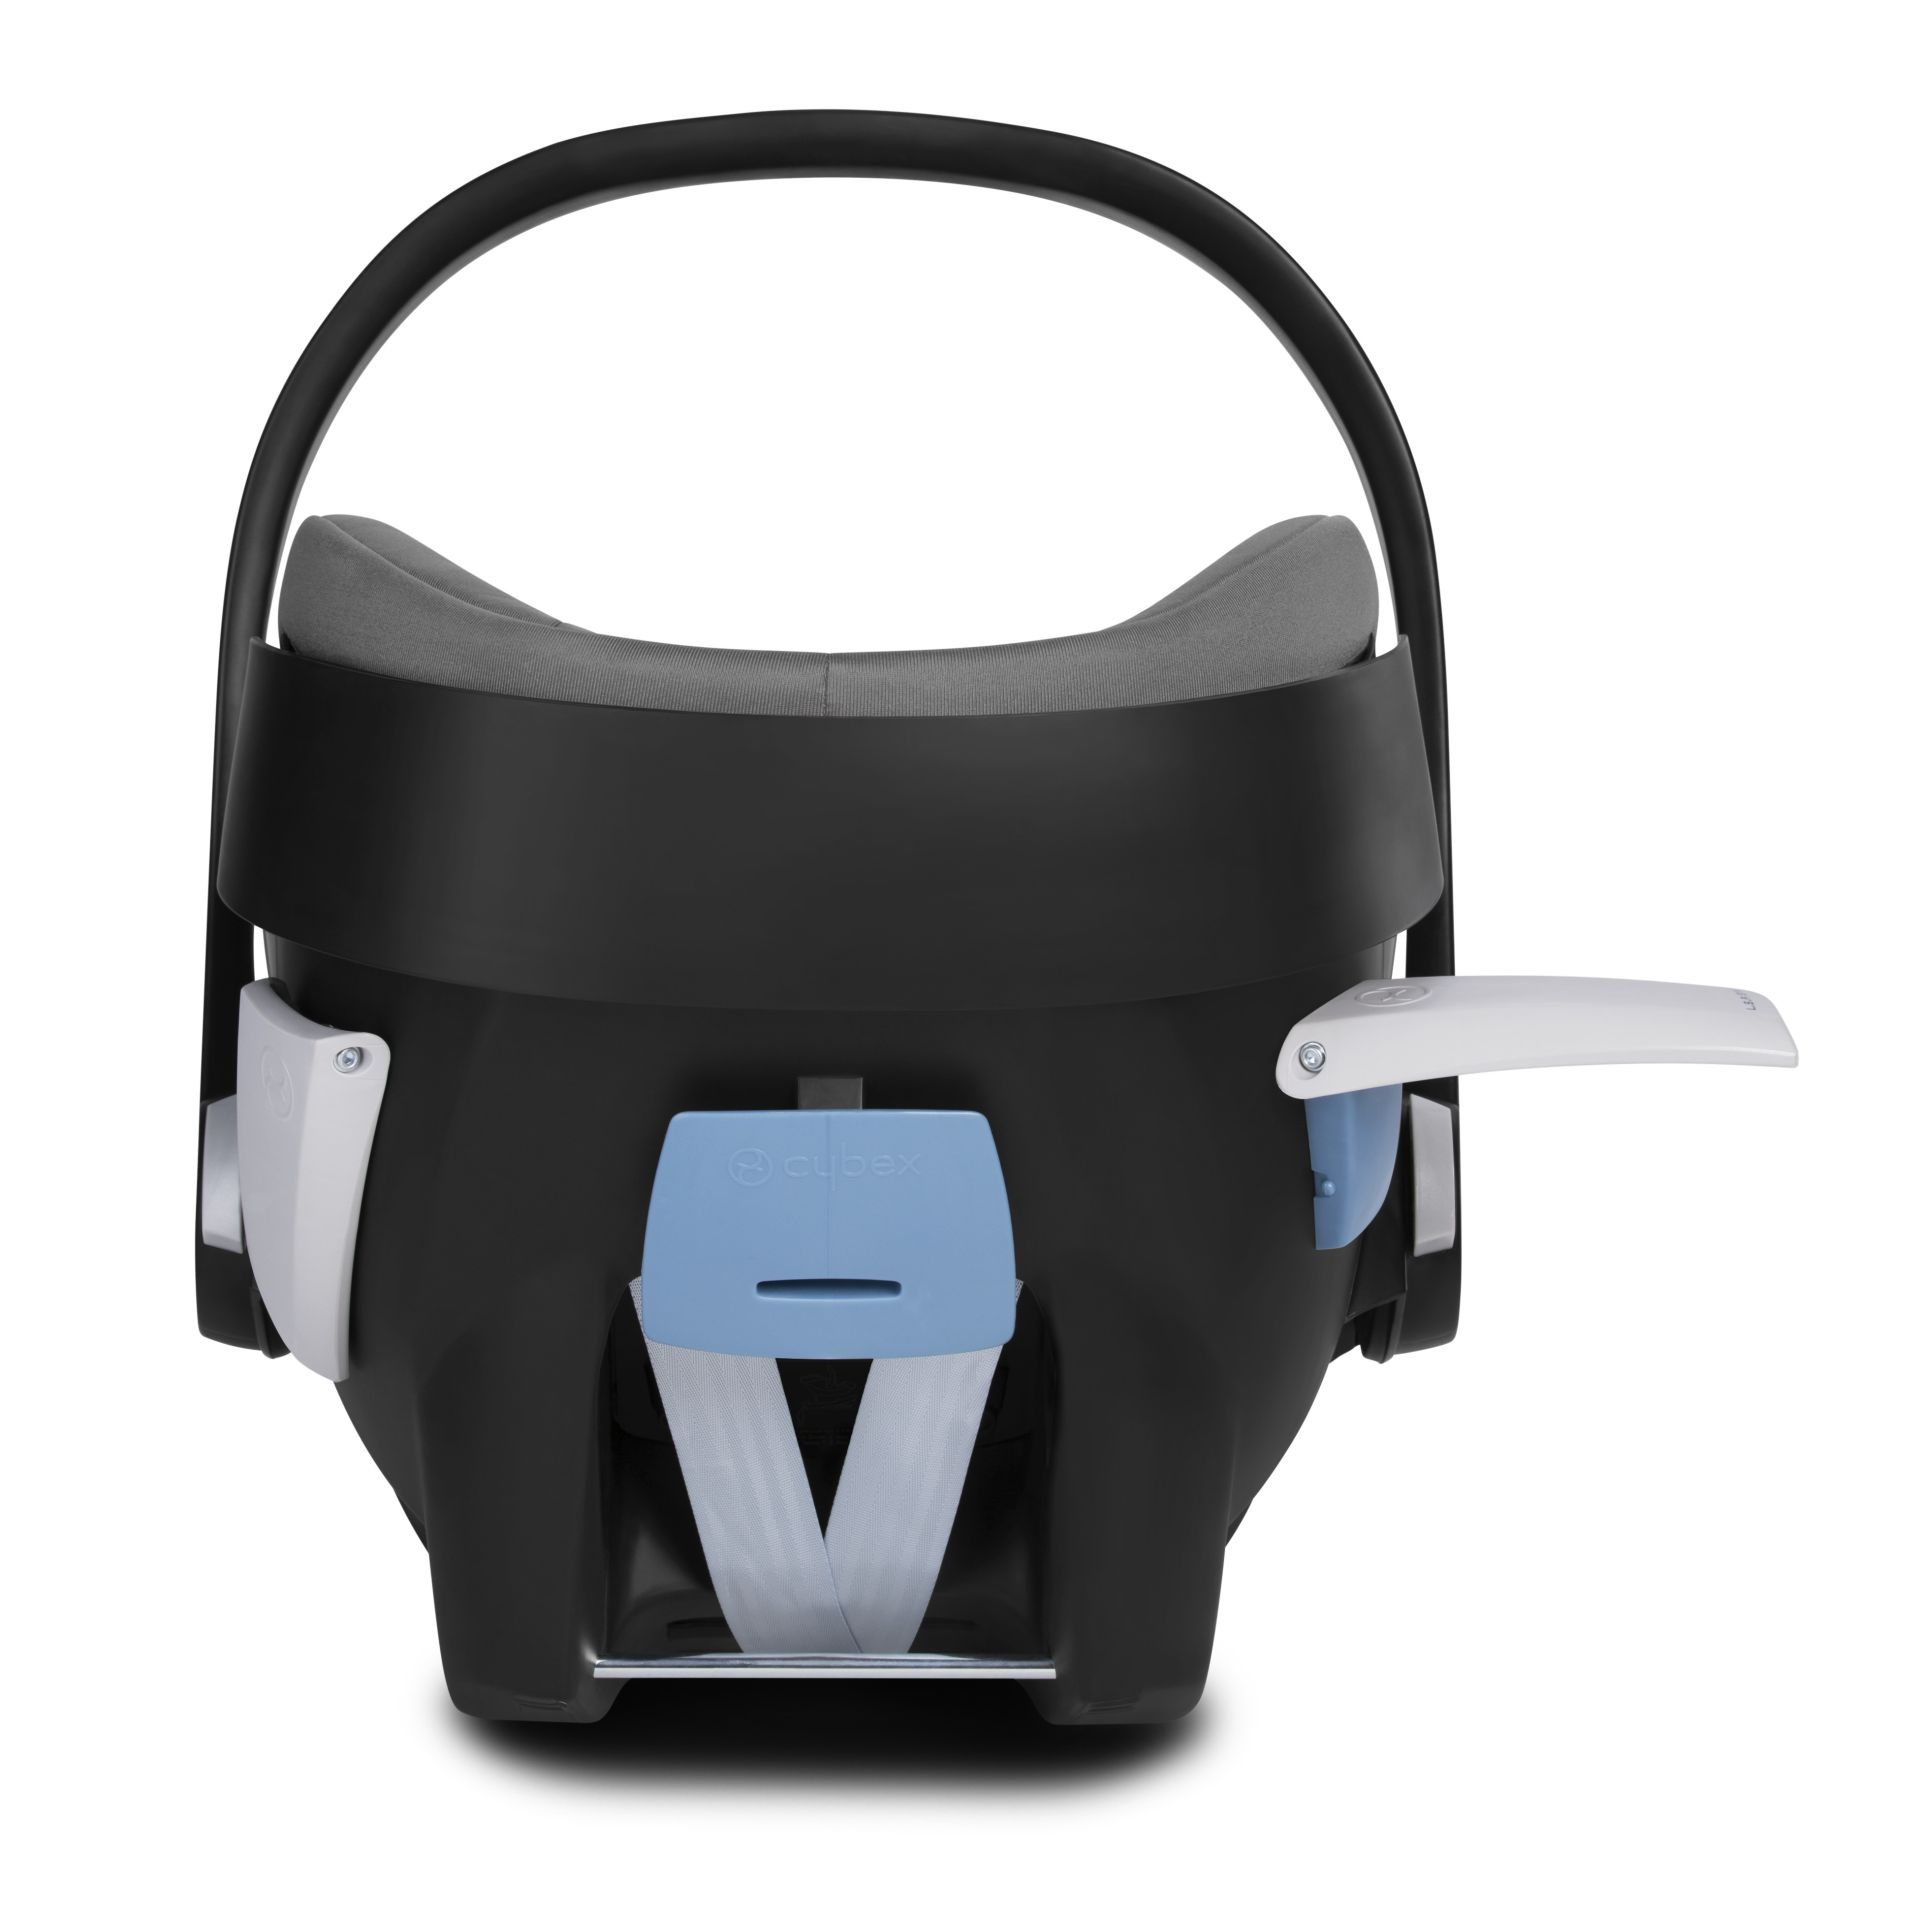 cybex infant car seat aton 5 2018 lavastone black black. Black Bedroom Furniture Sets. Home Design Ideas